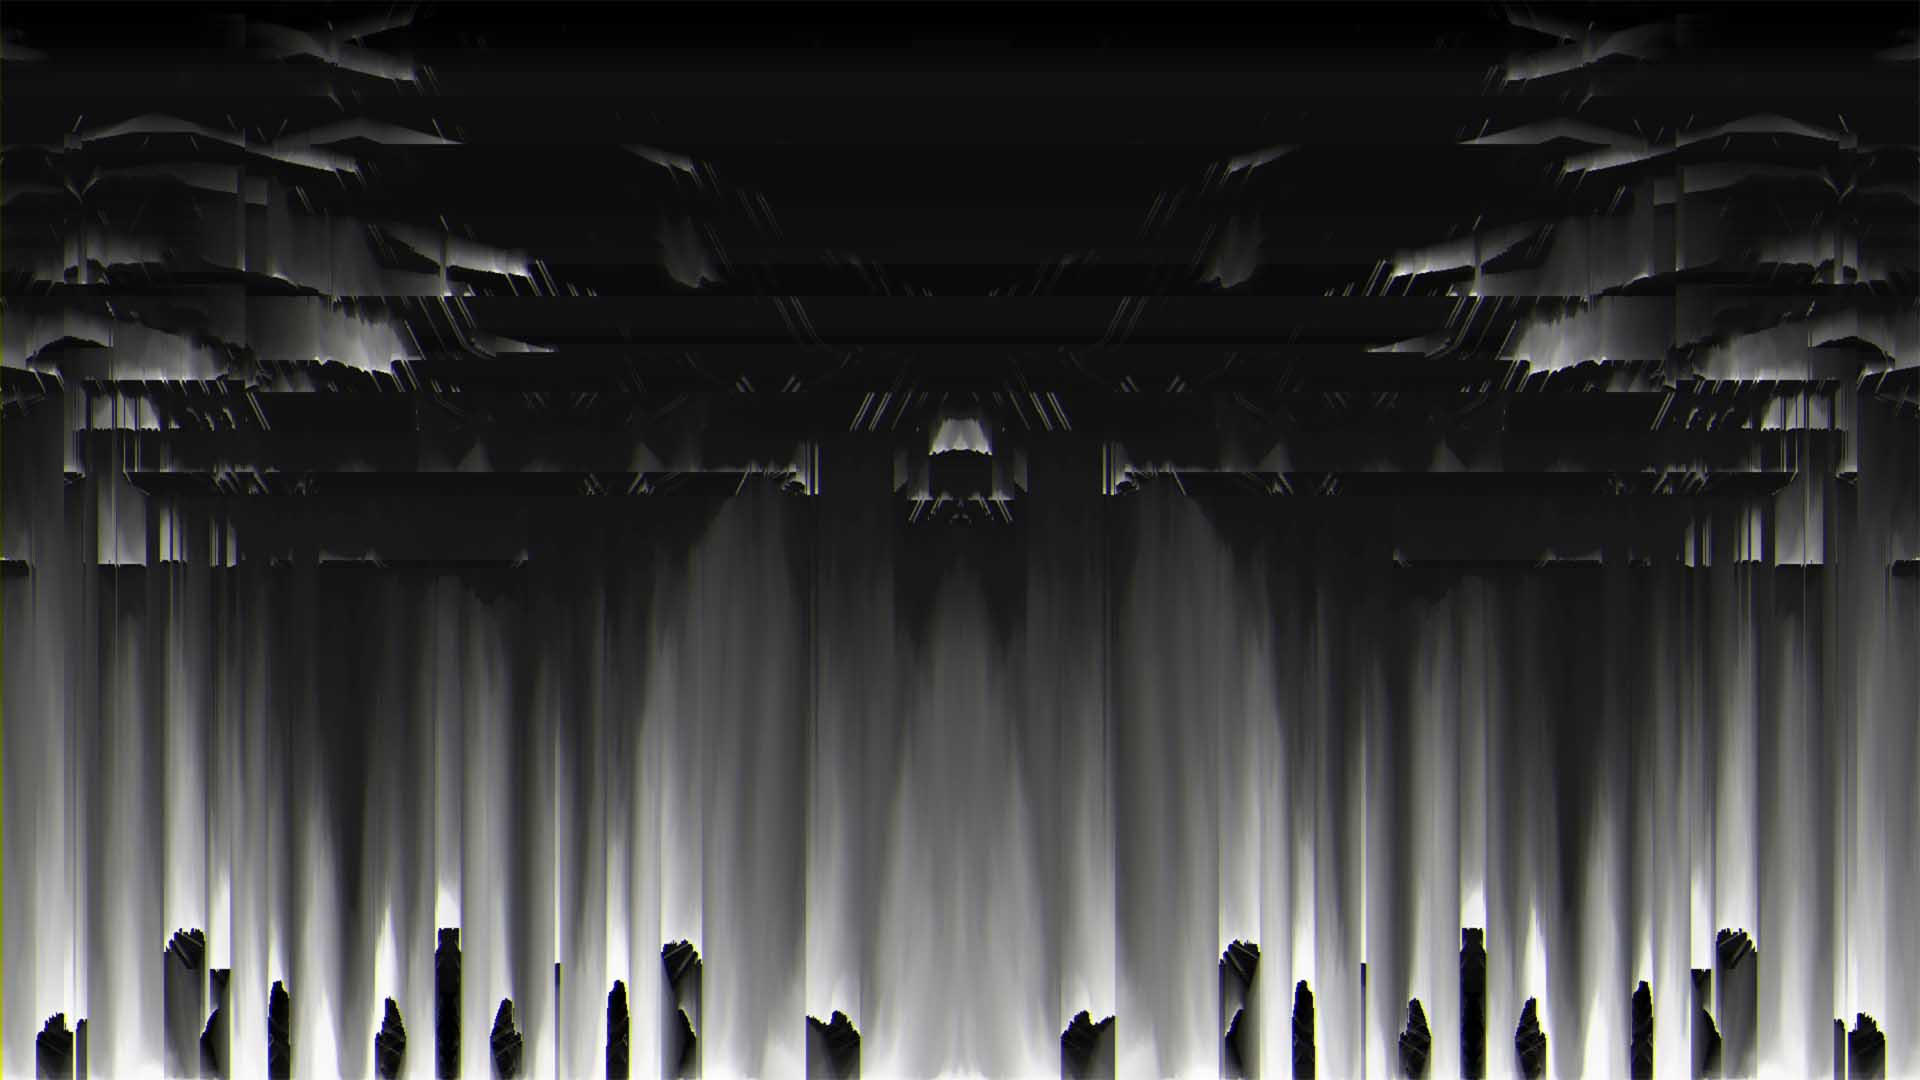 glitch backgrounds video